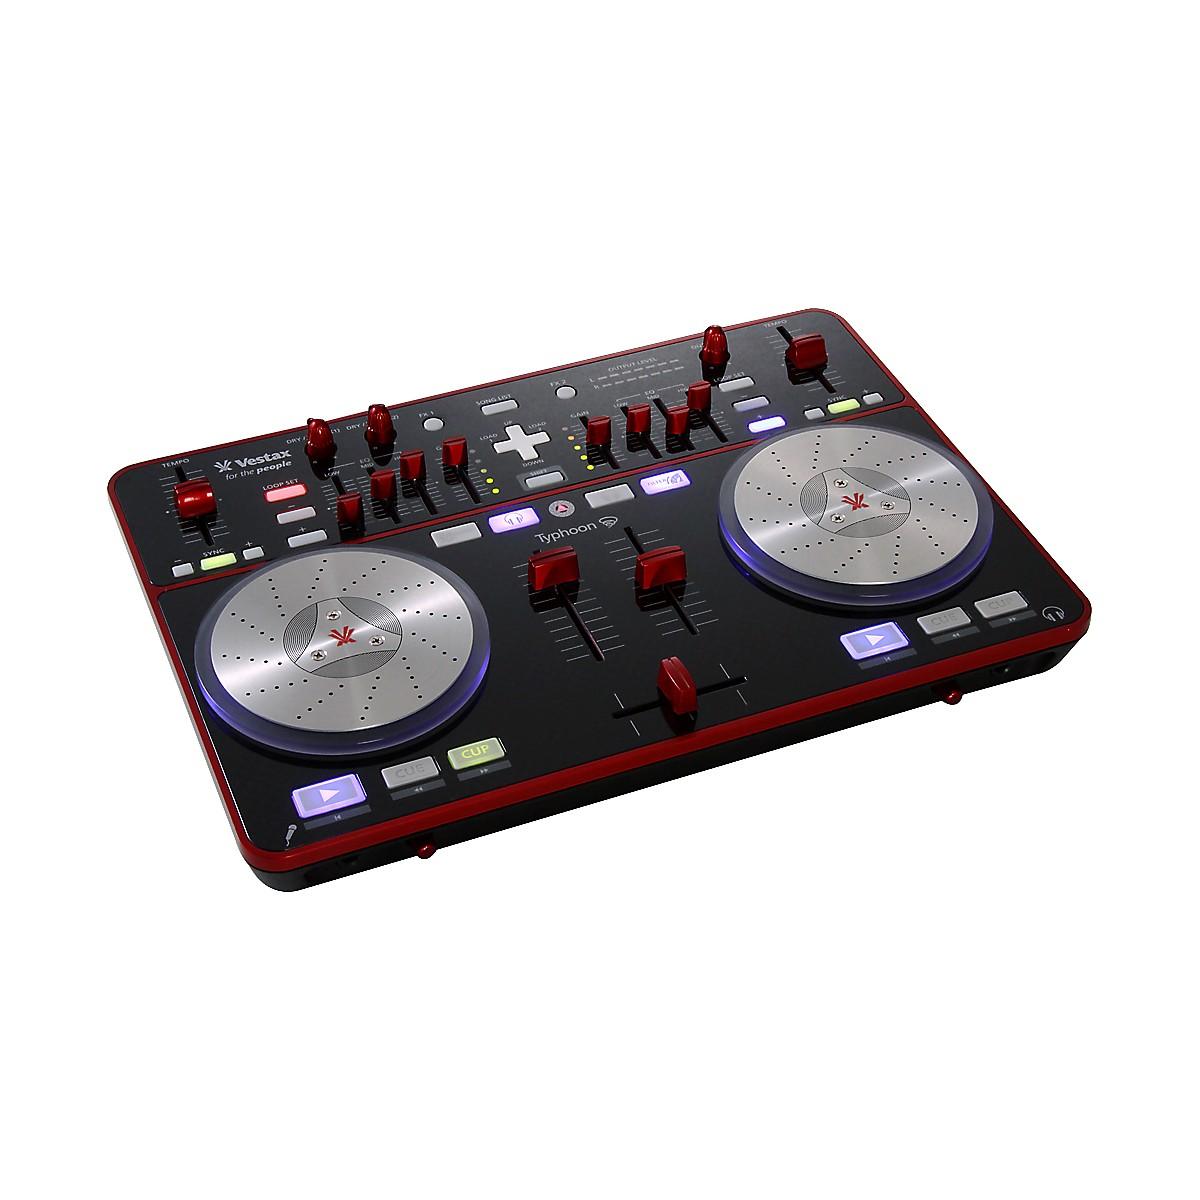 Vestax Typhoon DJ MIDI controller with sound card